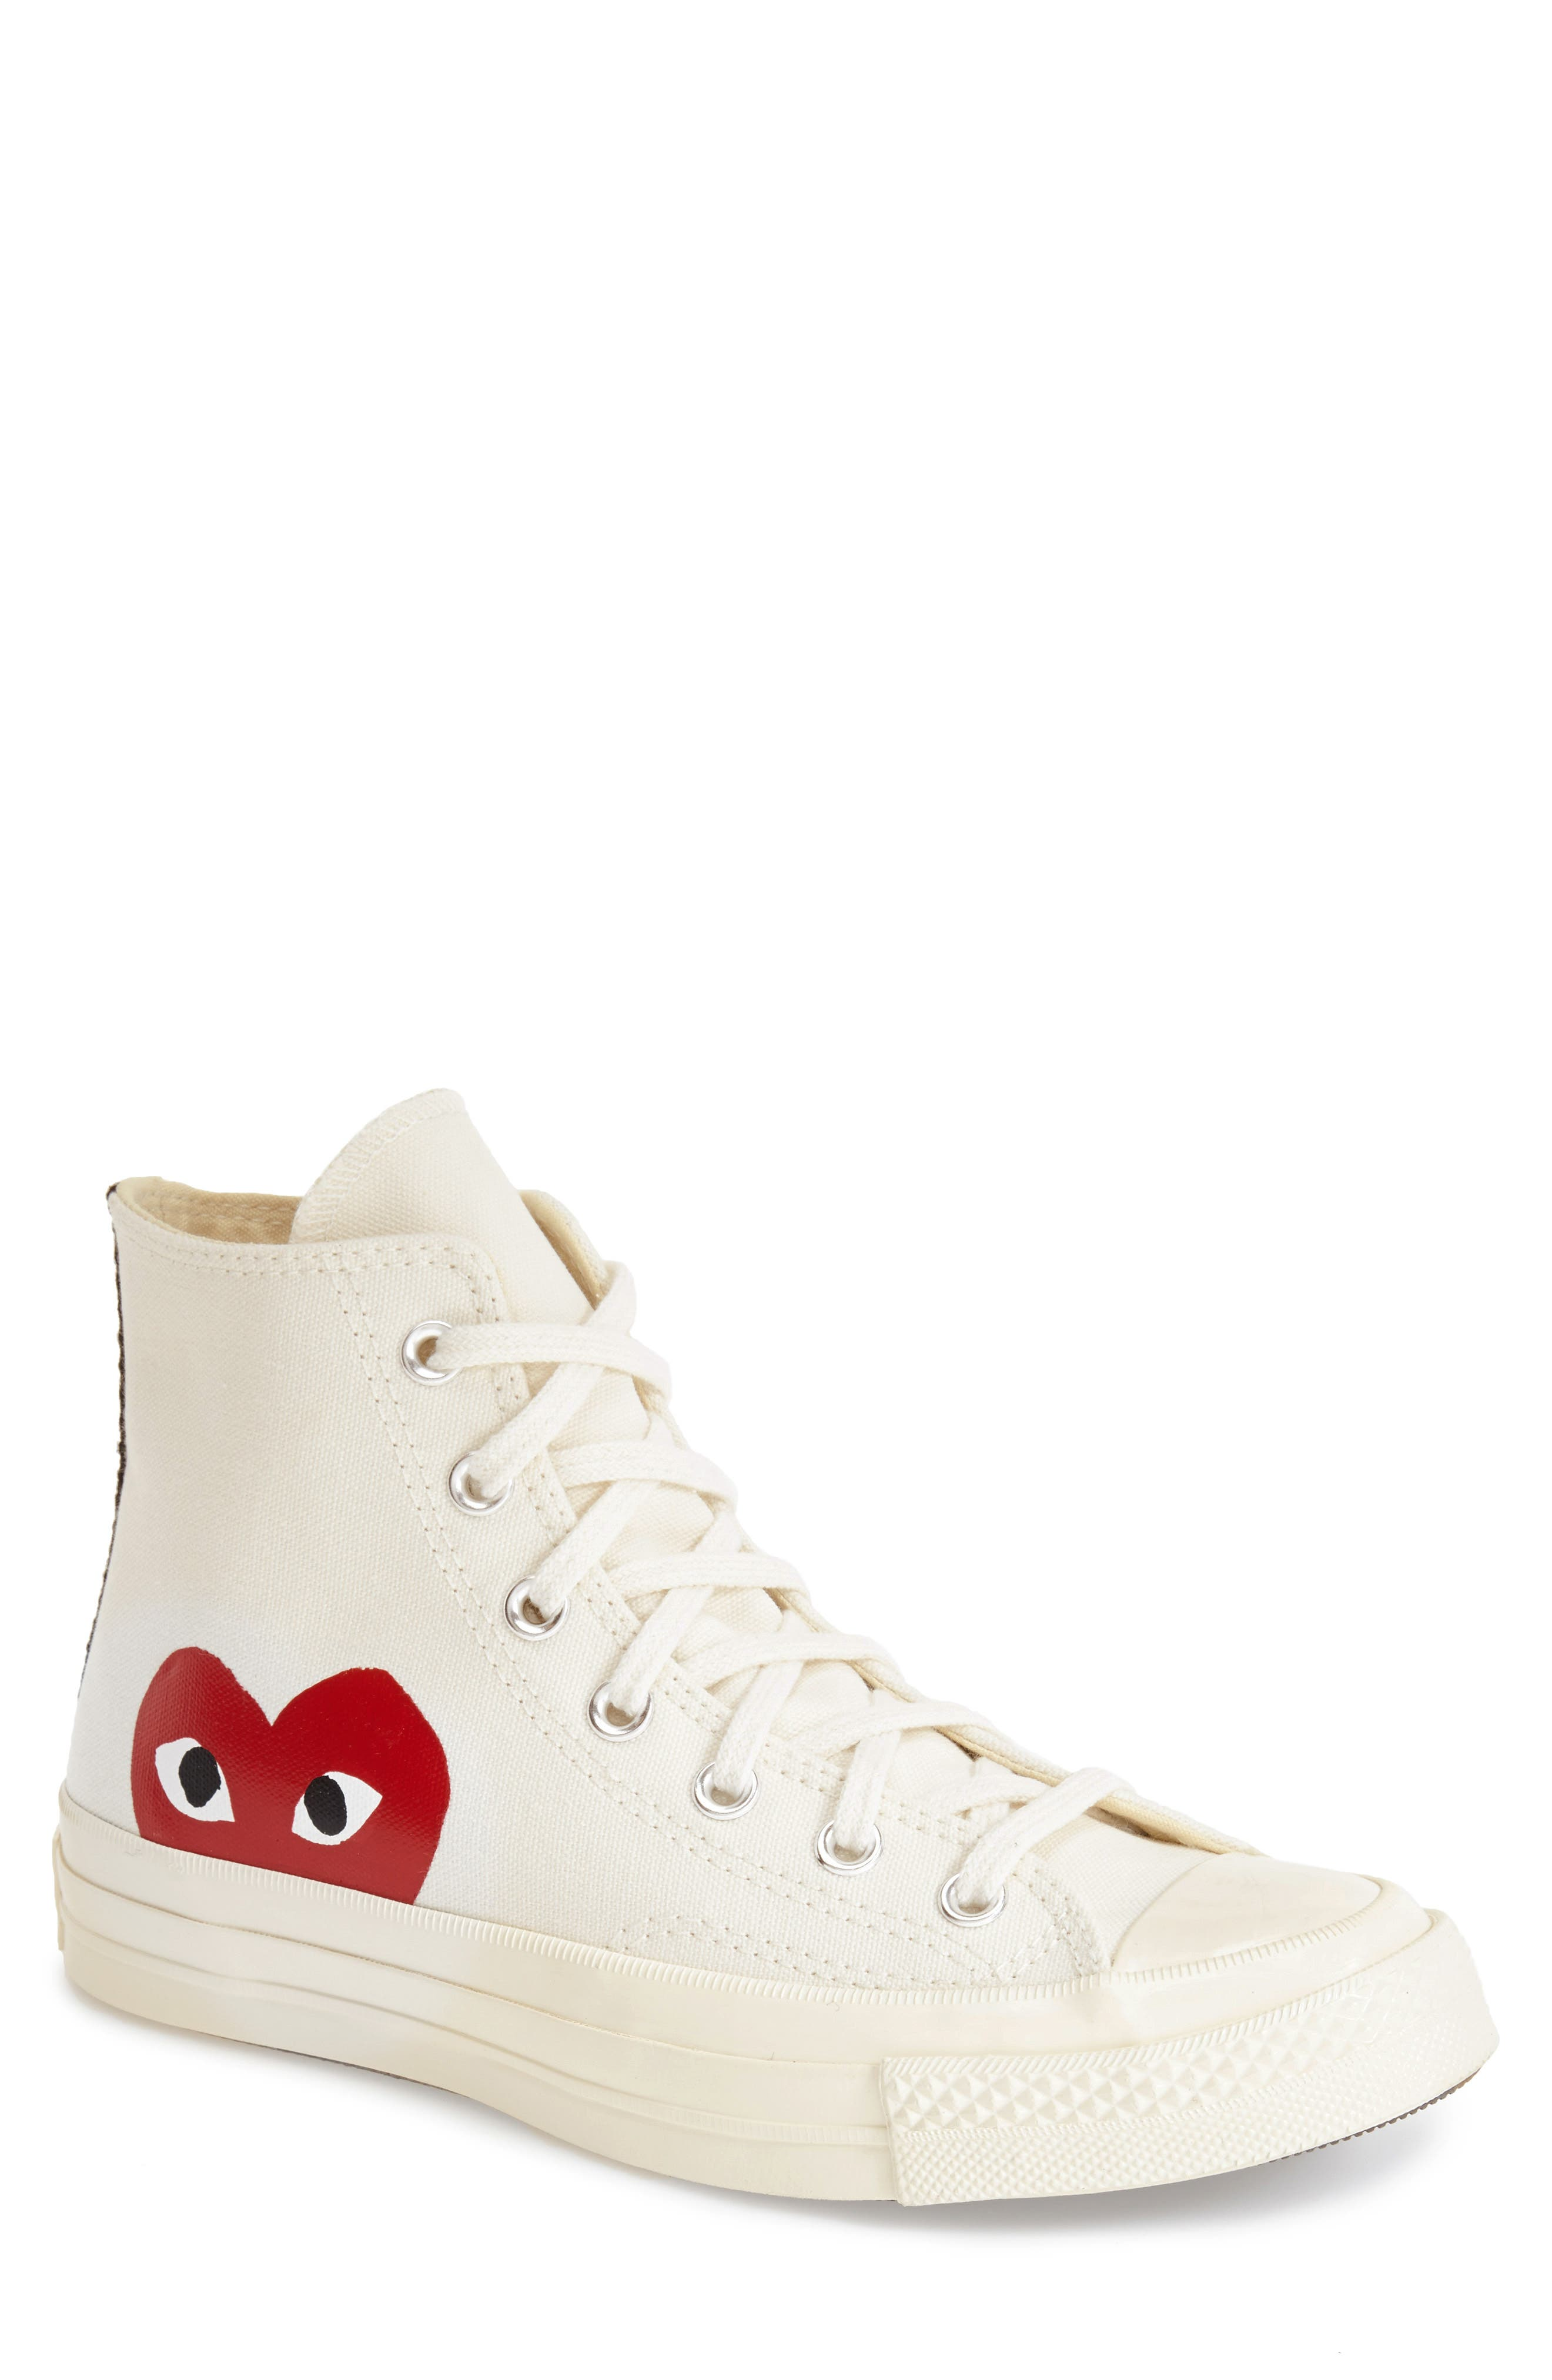 Comme des Garçons PLAYx Converse Chuck Taylor<sup>®</sup> - Hidden Heart High TopSneaker,                             Main thumbnail 1, color,                             White Canvas